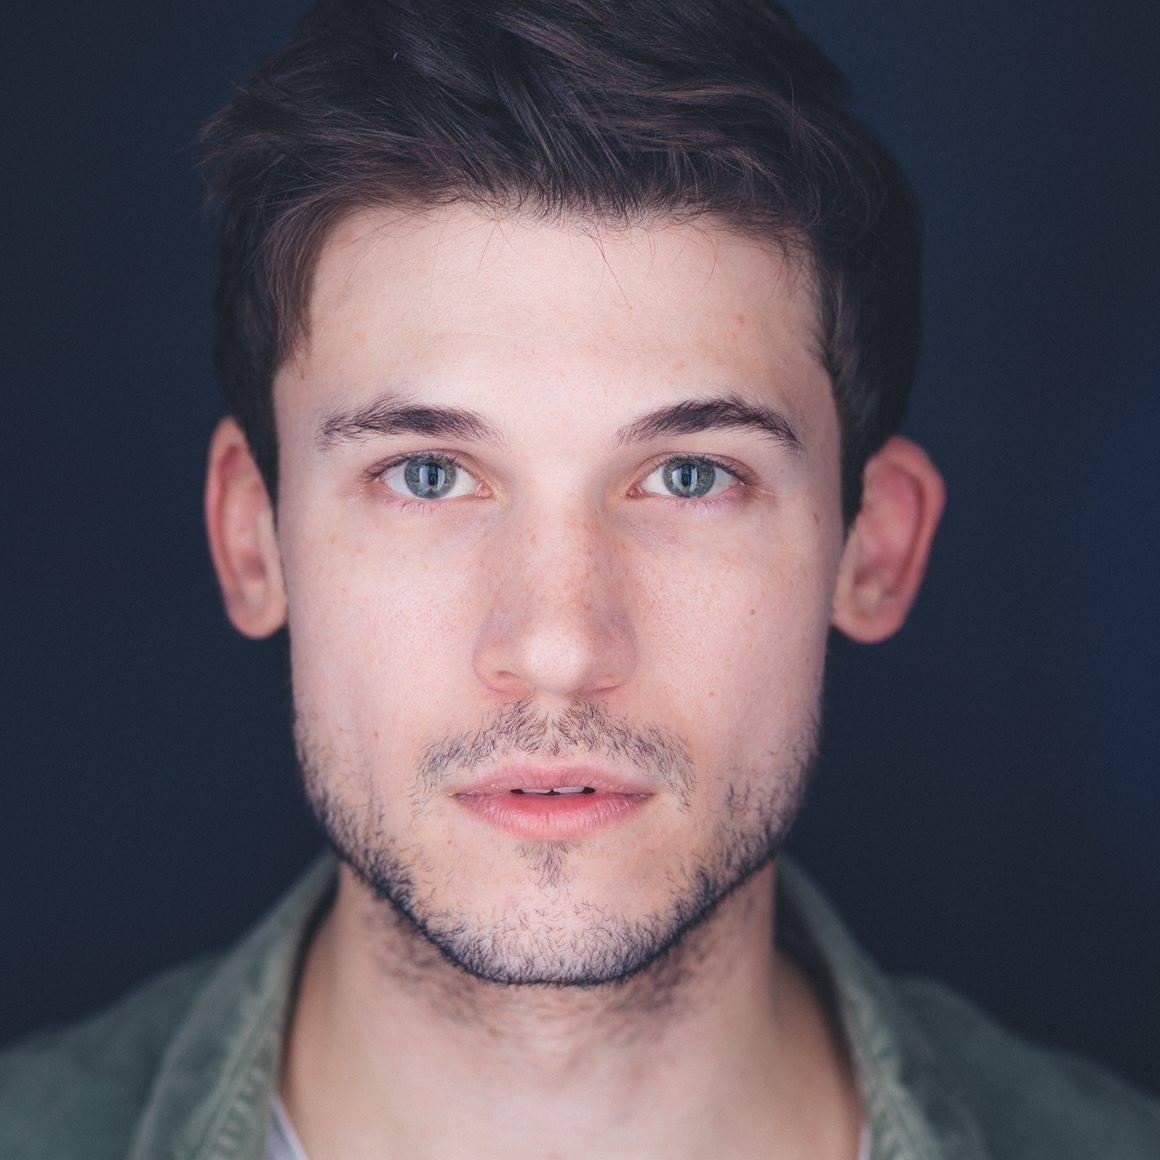 Peter Marrick Smith Broadway Best Vocal Coach Matt Farnsworth Vocal Studio Best Voice Teacher in the World NY MF Voice app Singing